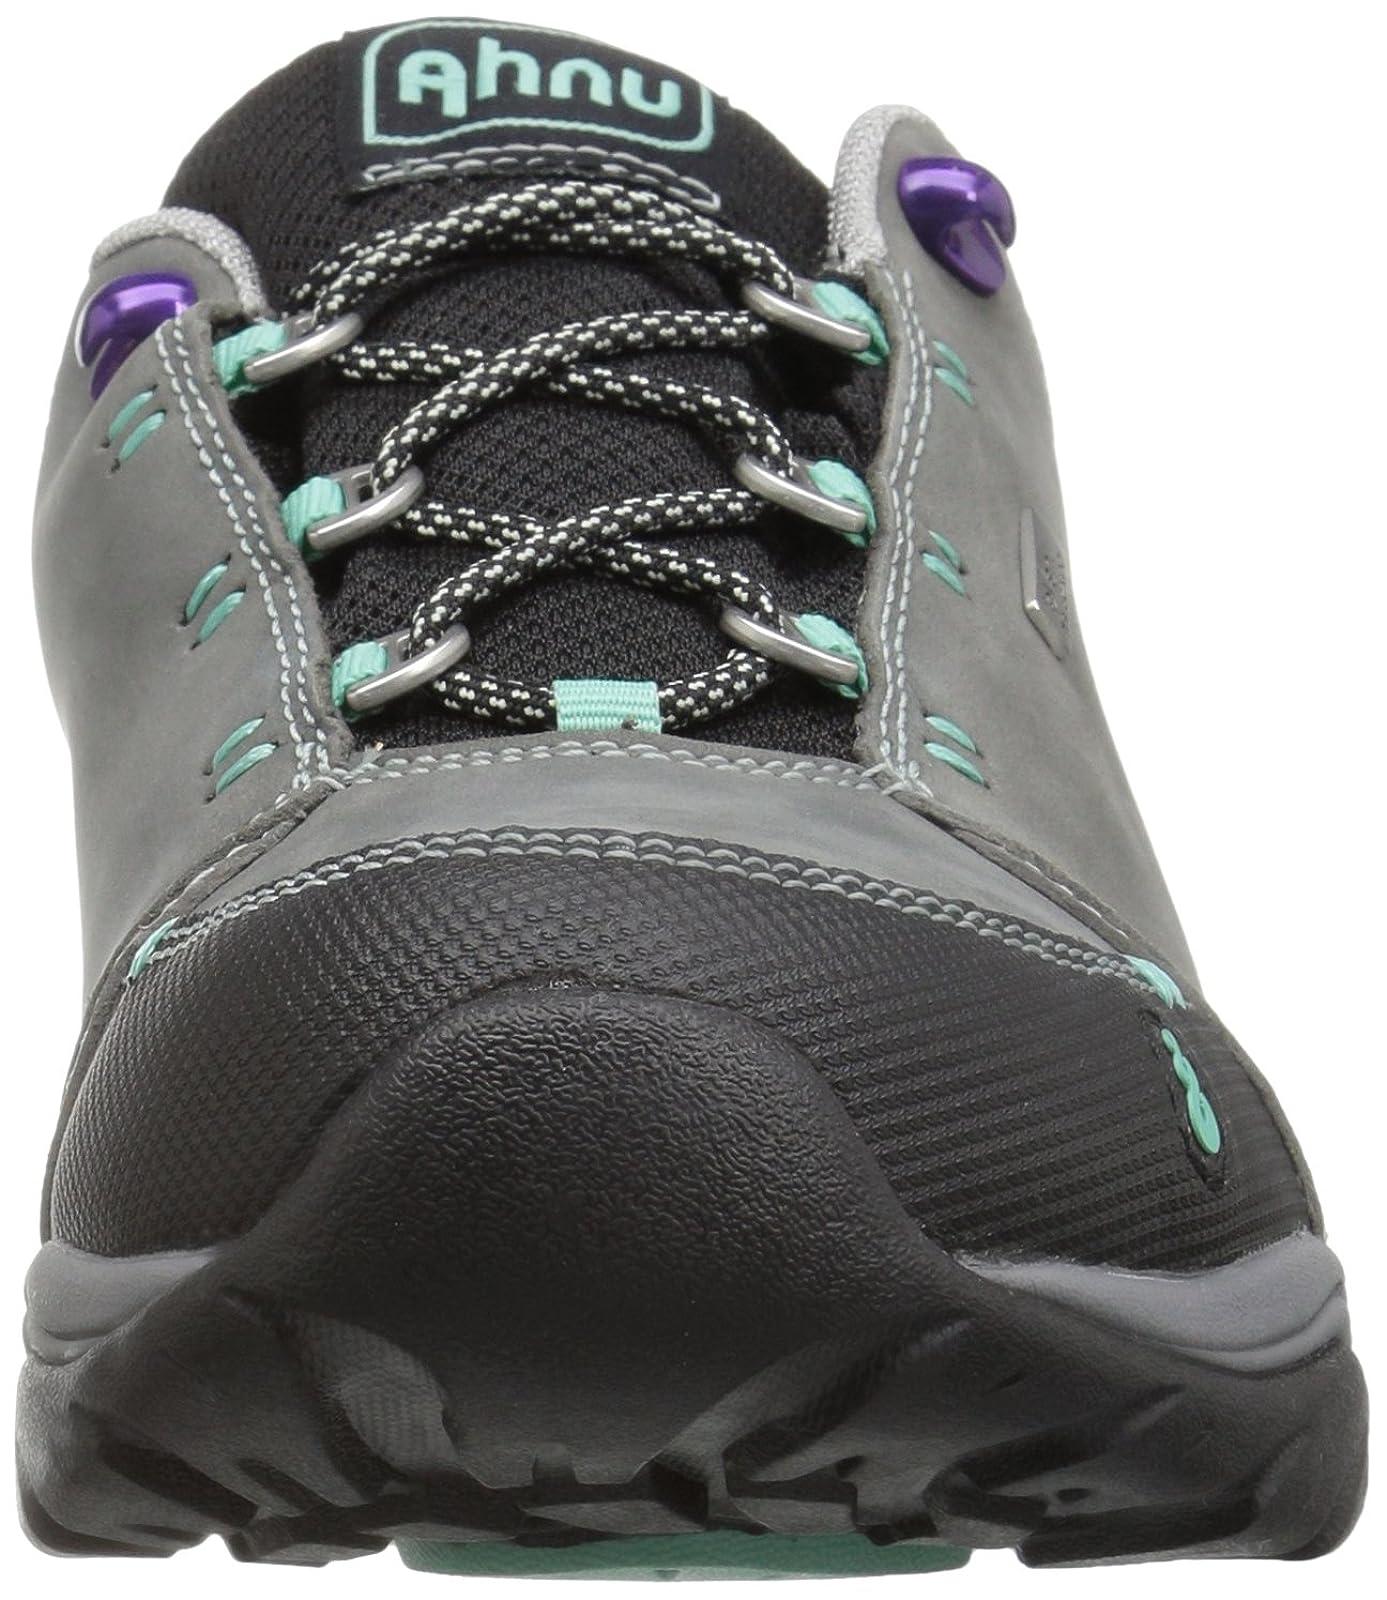 Ahnu Women's Montara II Hiking Shoe Black 6 B(M) US - 4